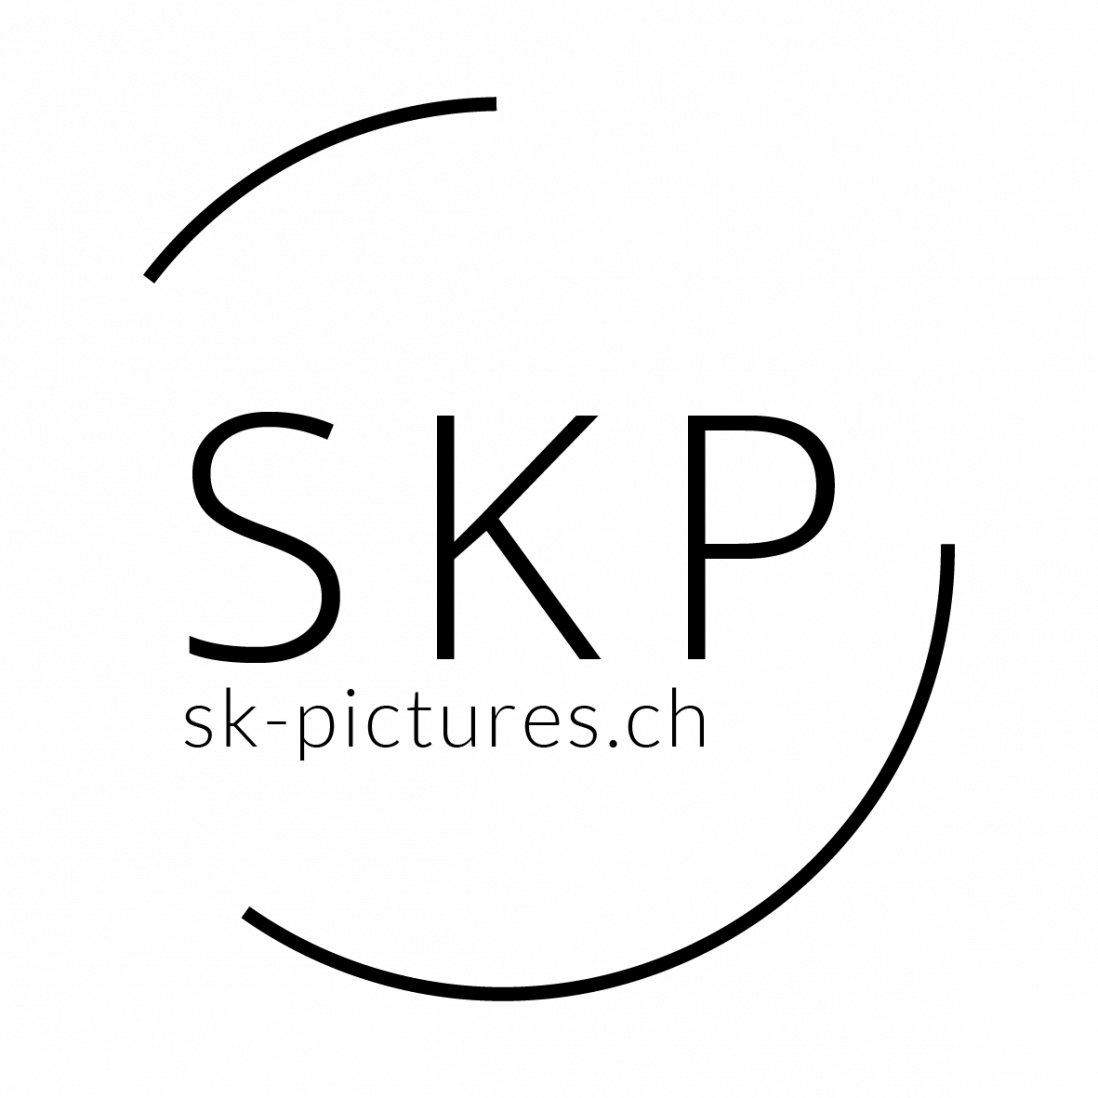 Logo_Var3_Bildmarke_Web.png